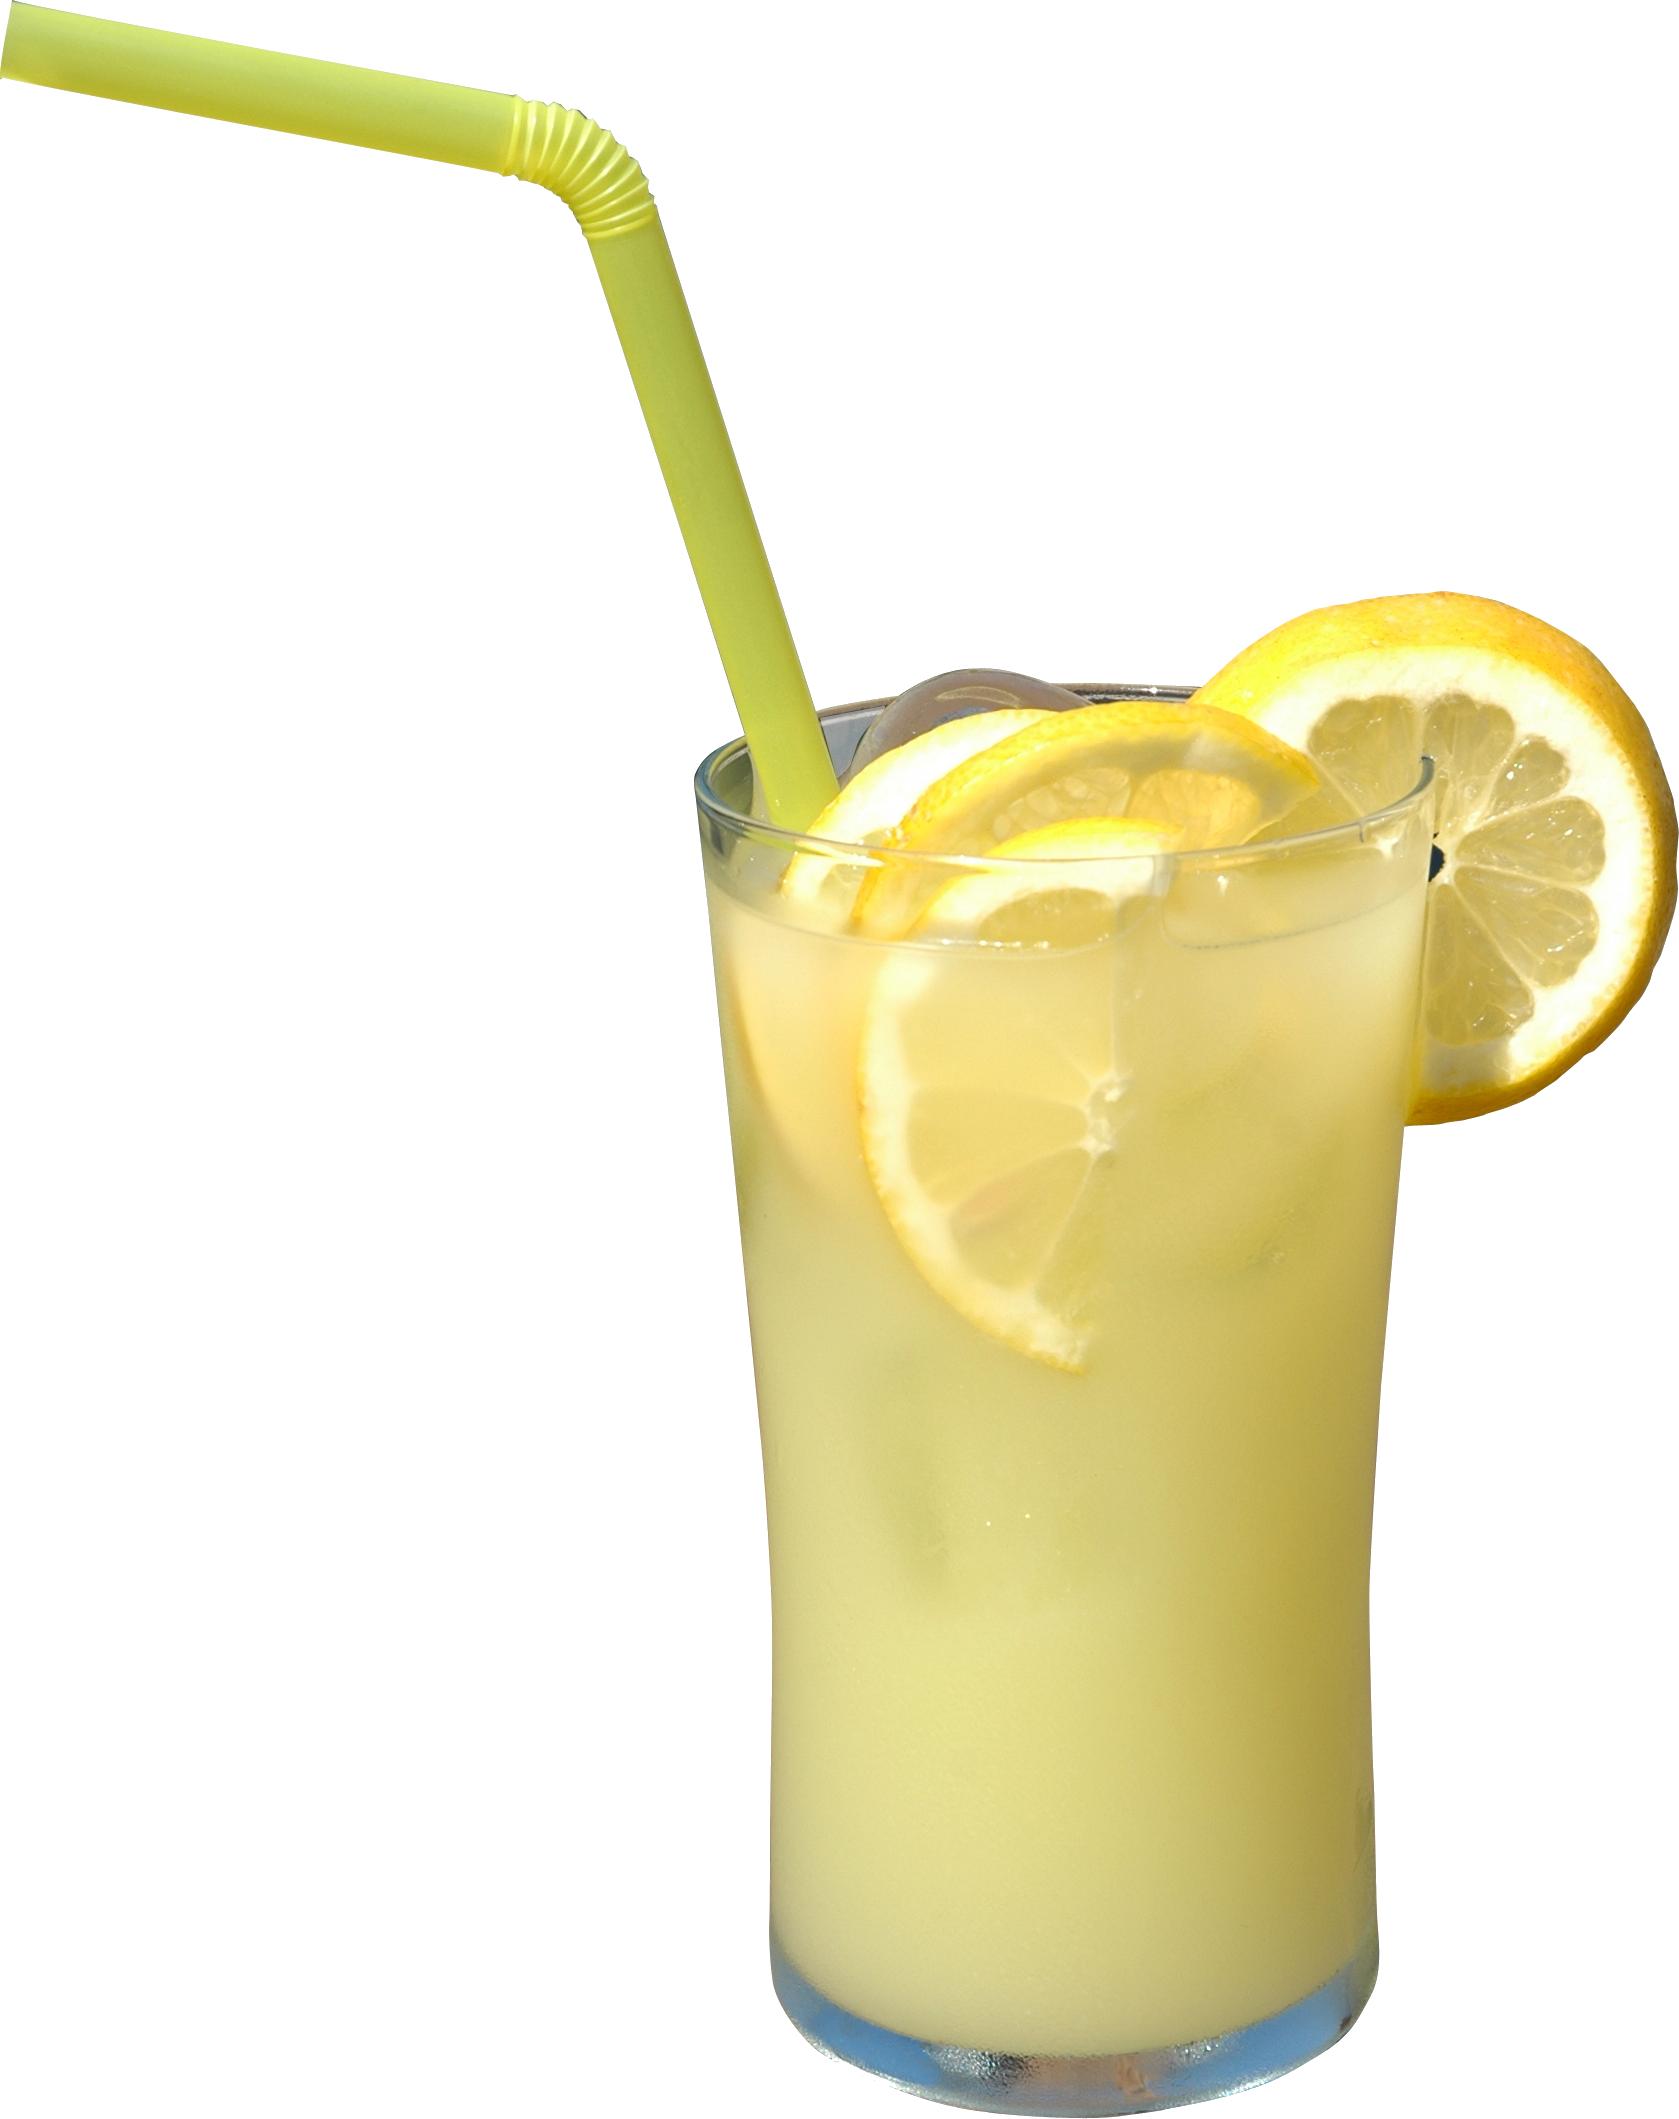 lemonade_PNG16955 PNG Image - PurePNG   Free transparent CC0 PNG ...